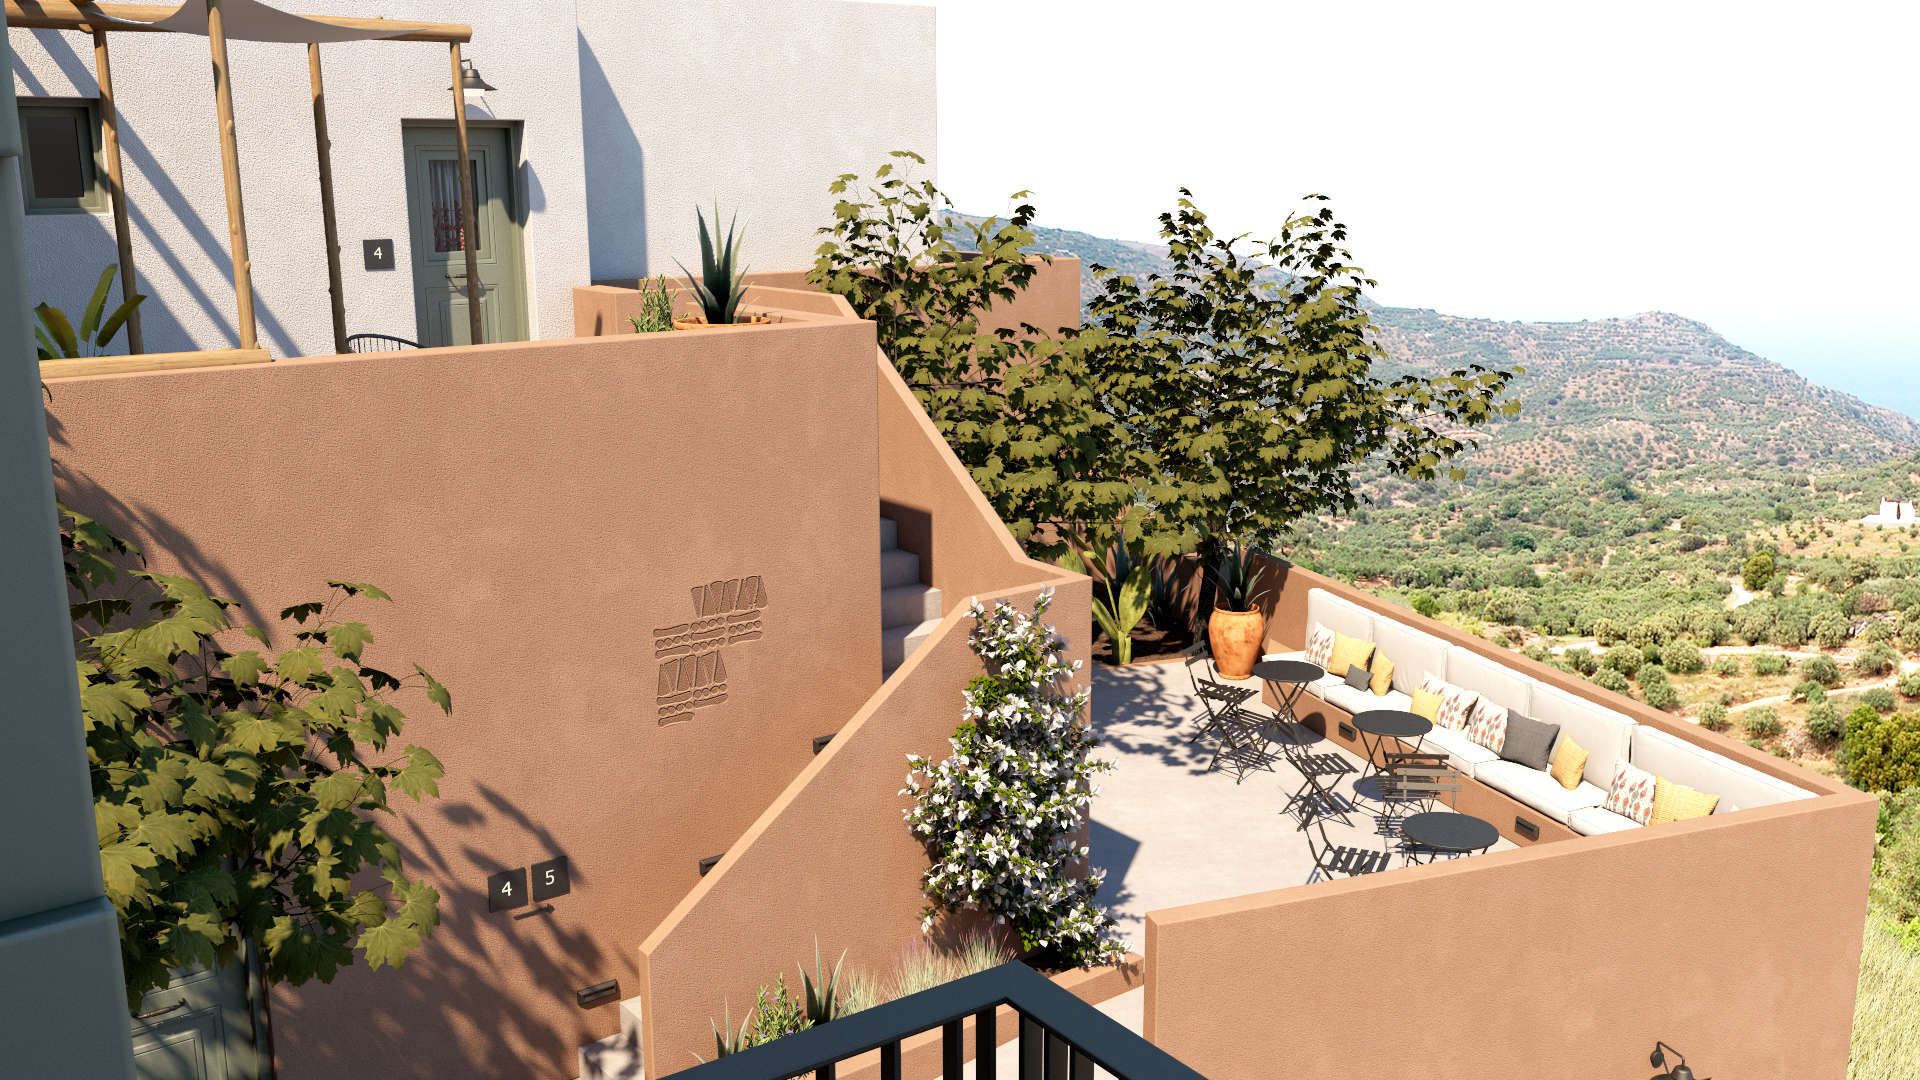 Hotel in a village, exterior design, facades, view of landscape. Τουριστικό κατάλυμα σε οικισμό, εξωτερικές διαμορφώσεις, όψεις, θέα του τοπίου.